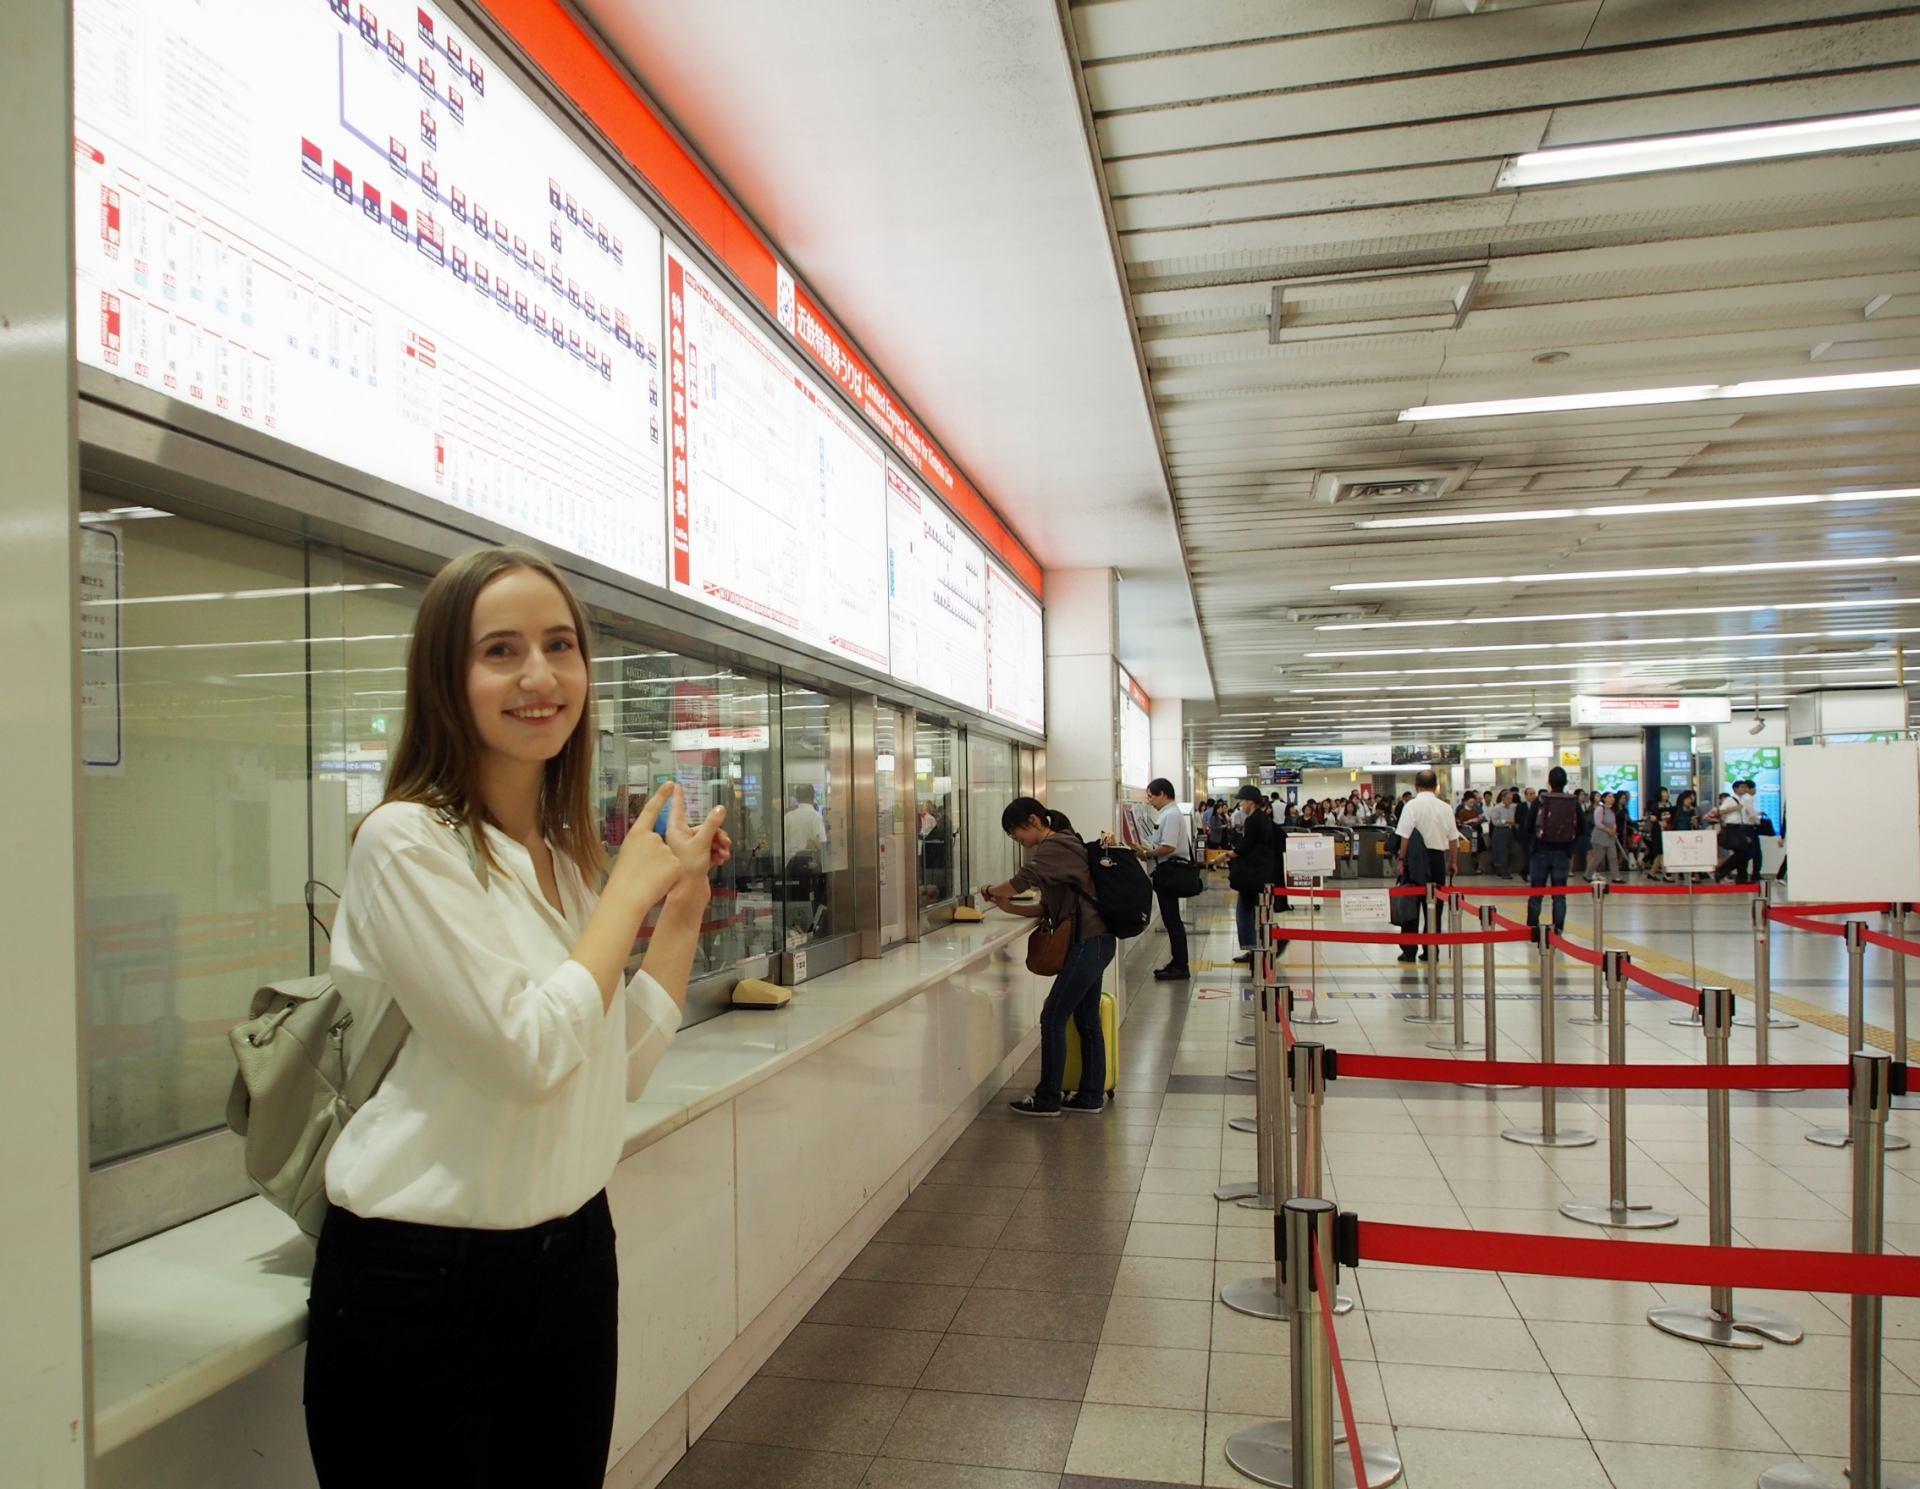 Purchasing the KINTETSU RAIL PASS at the express ticketing area